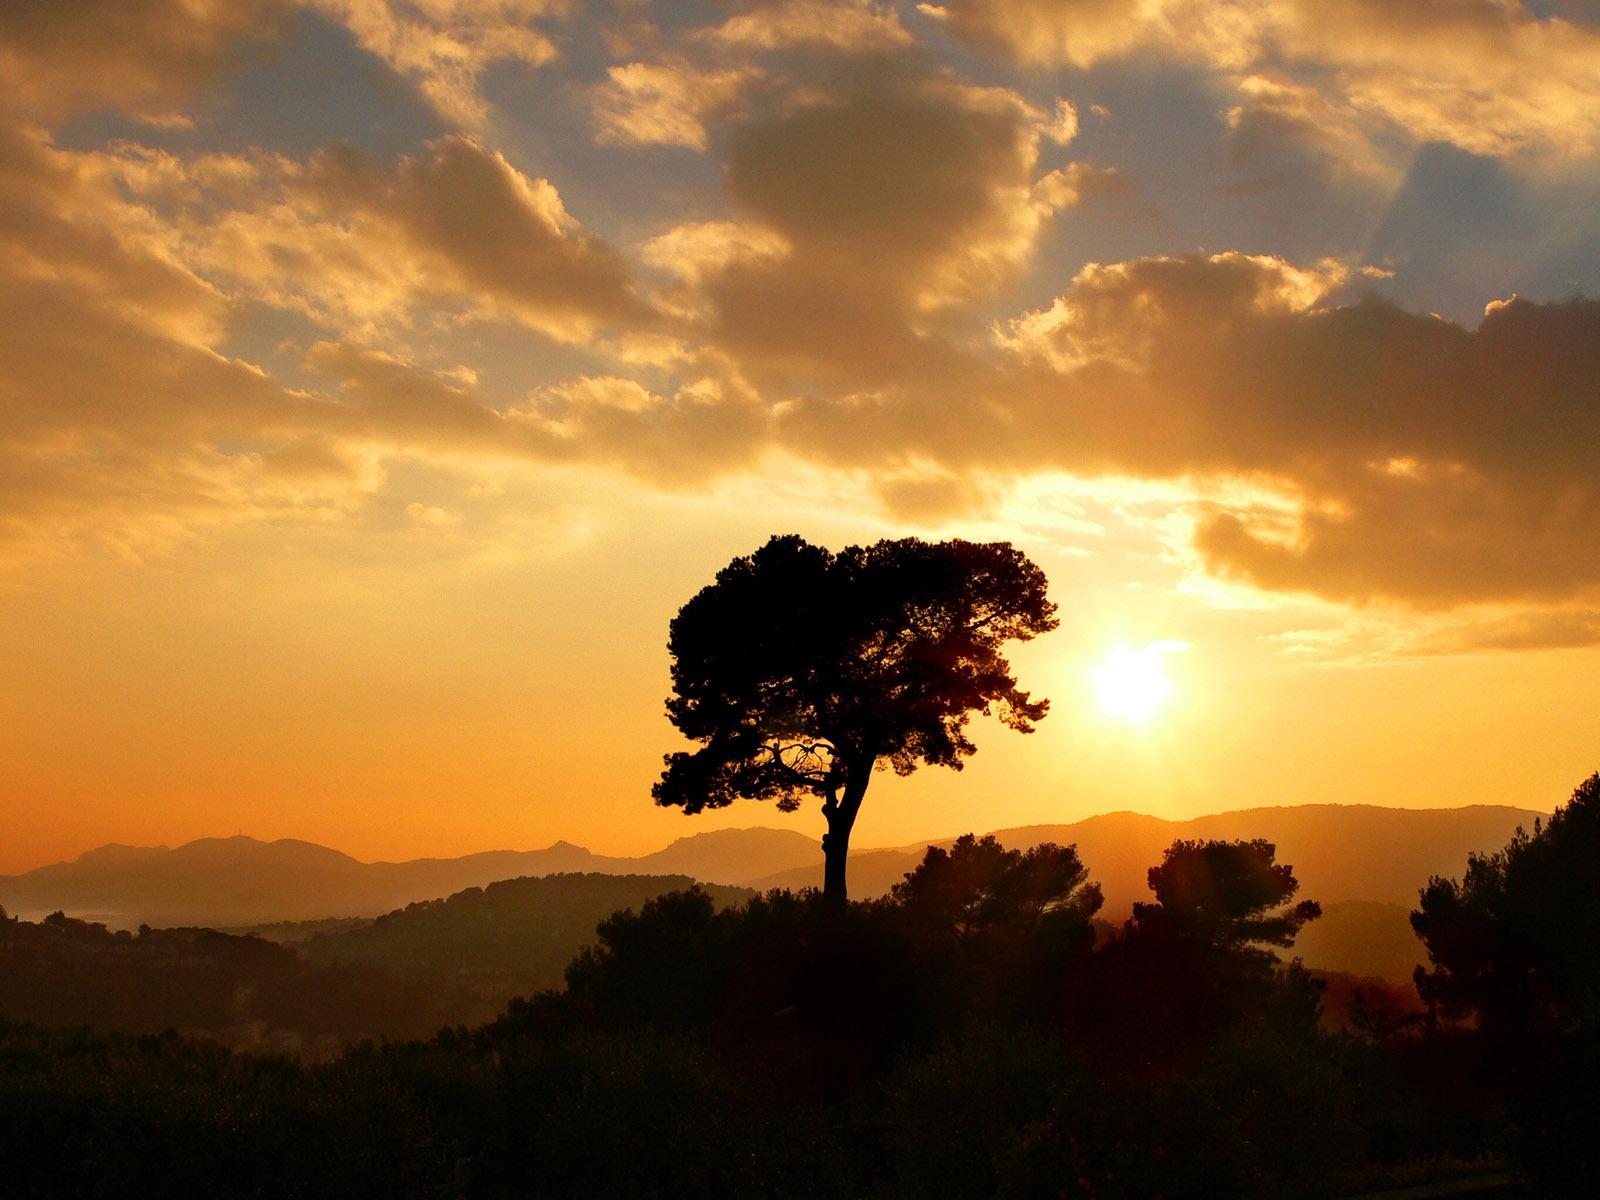 Wallpaper download download - Golden Tree Wallpaper Landscape Nature